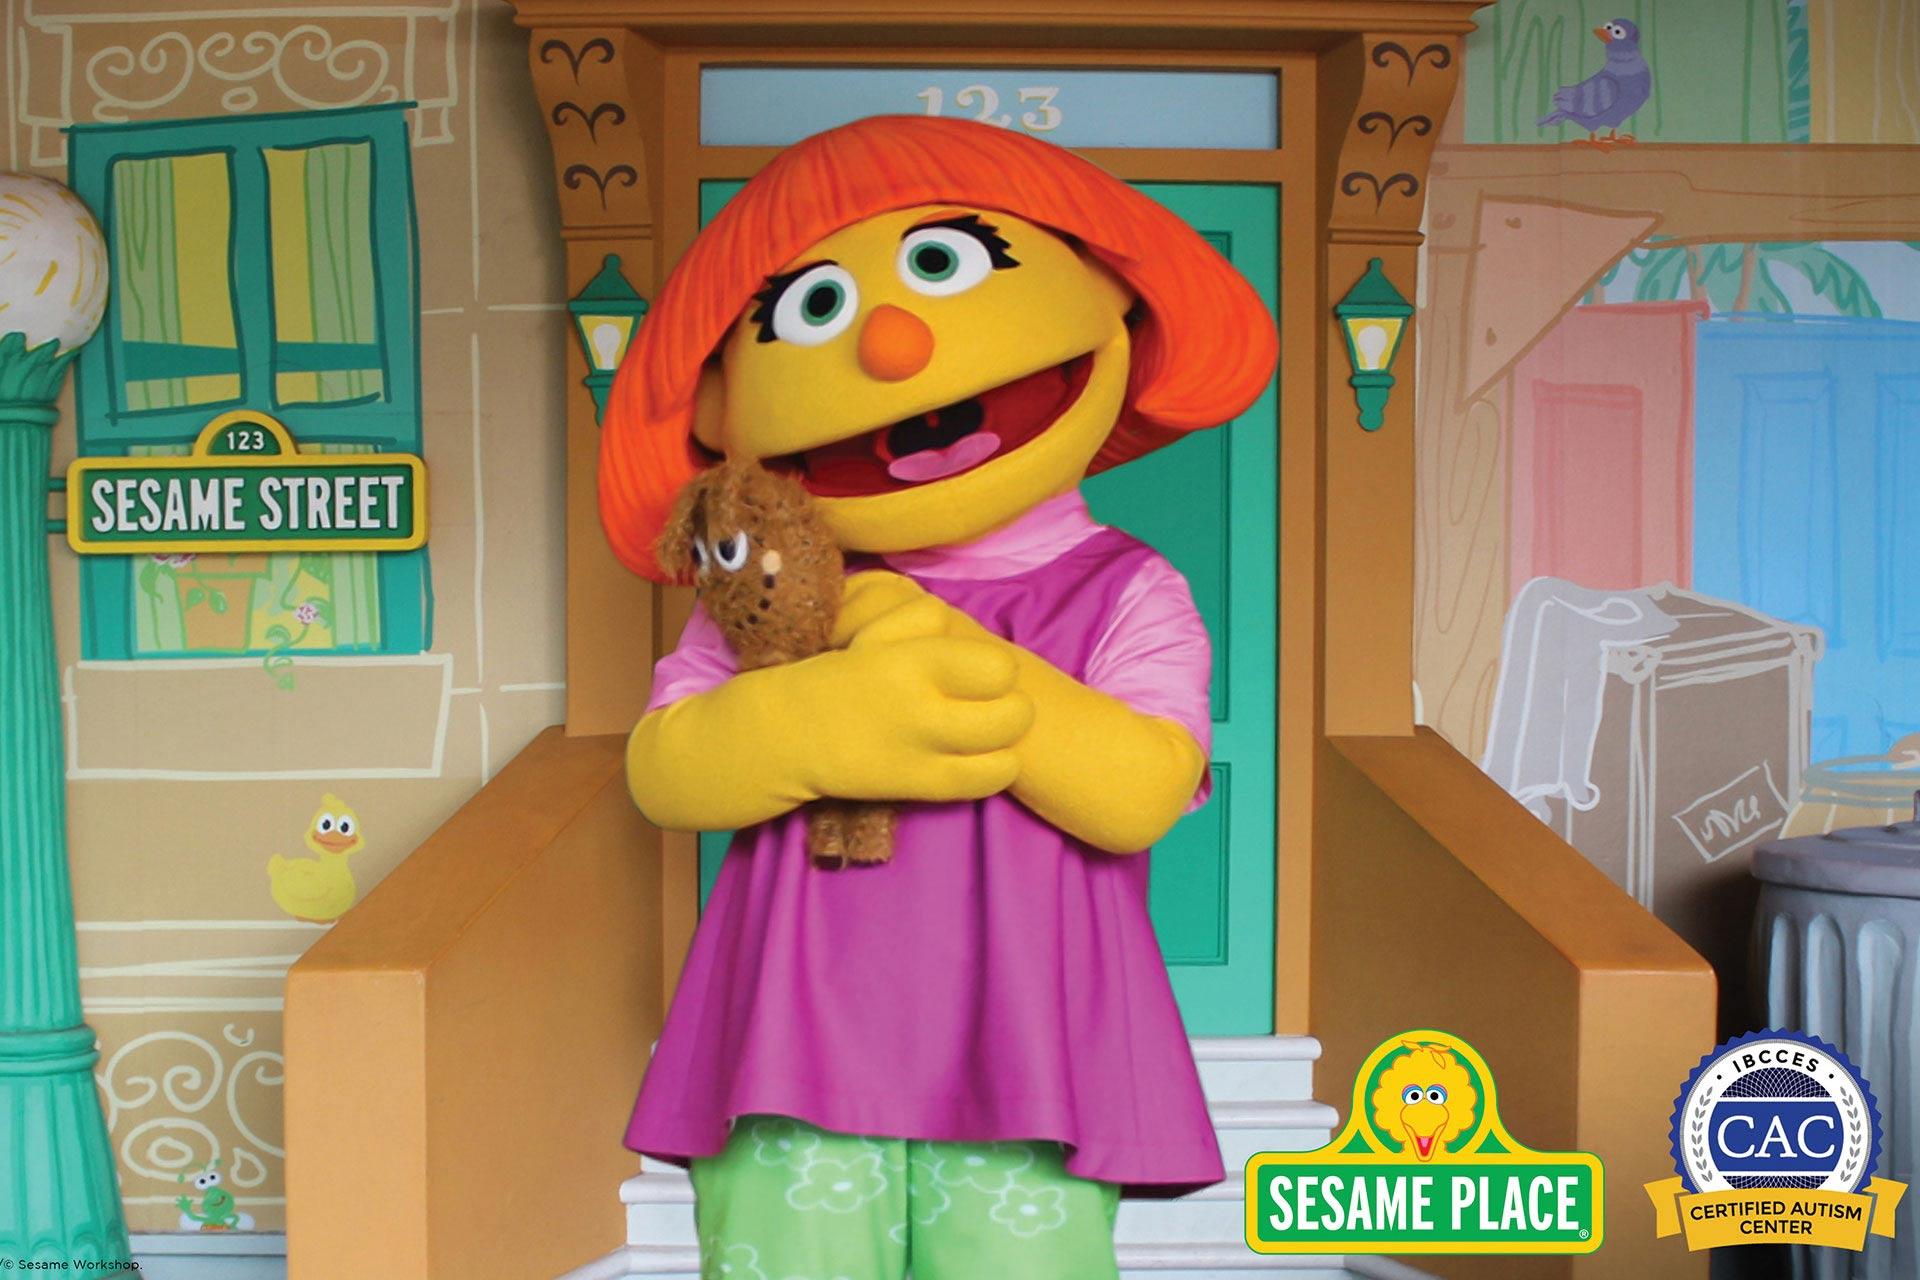 Sesame Place is an autism-friendly resort in Langhorne, Pennsylvania.